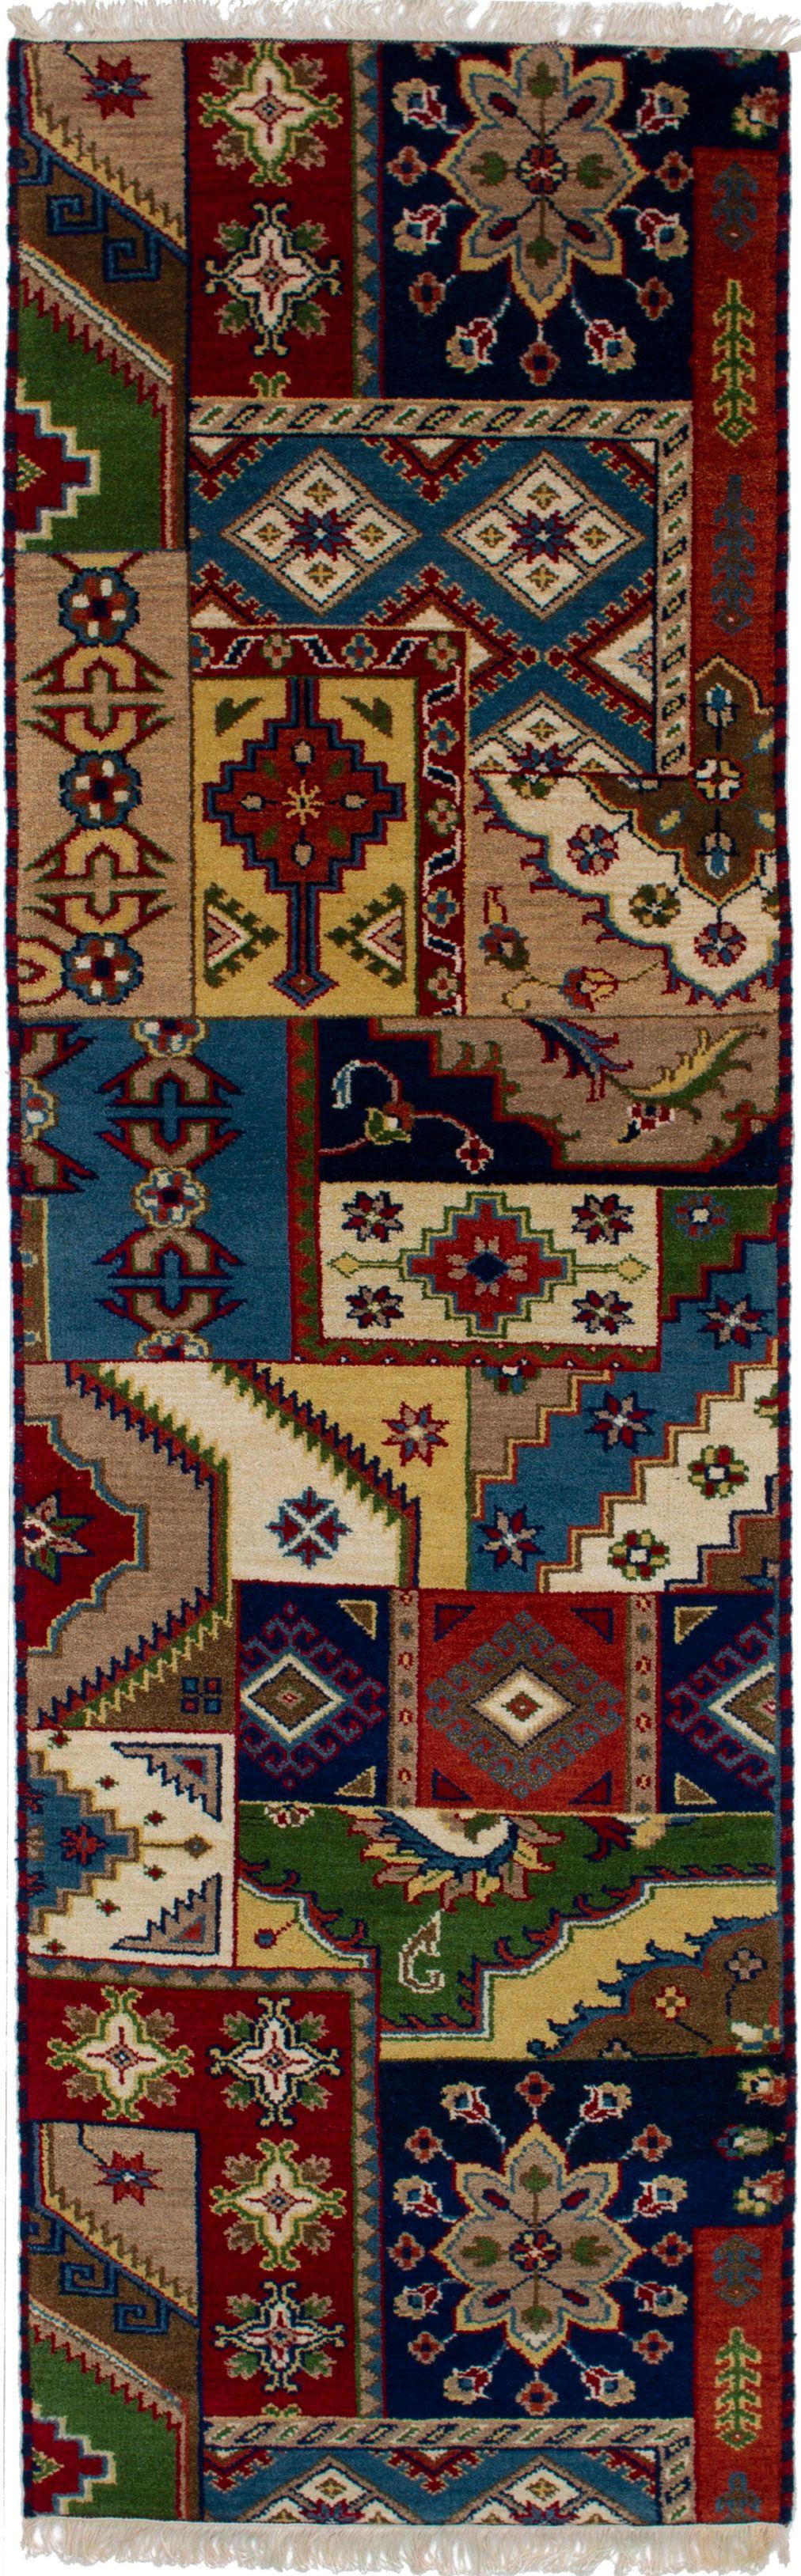 "Hand-knotted Finest Kazak Blue, Tan Wool Rug 2'8"" x 9'0"" Size: 2'8"" x 9'0"""